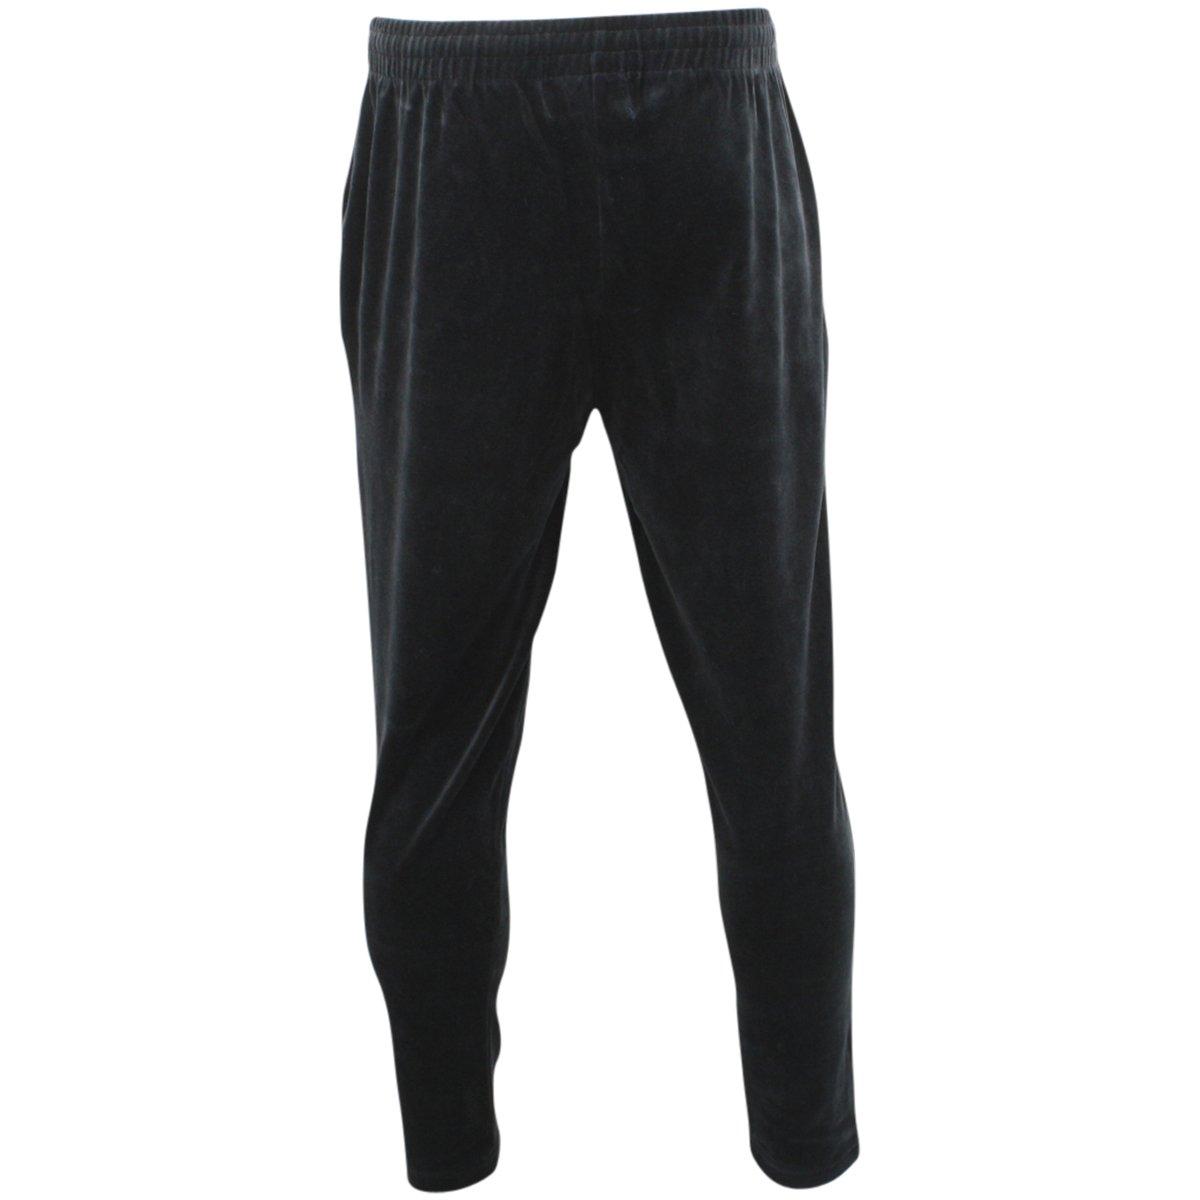 de5e72e319d Fila Mens Velour Slim Fit Pants at Amazon Men's Clothing store: